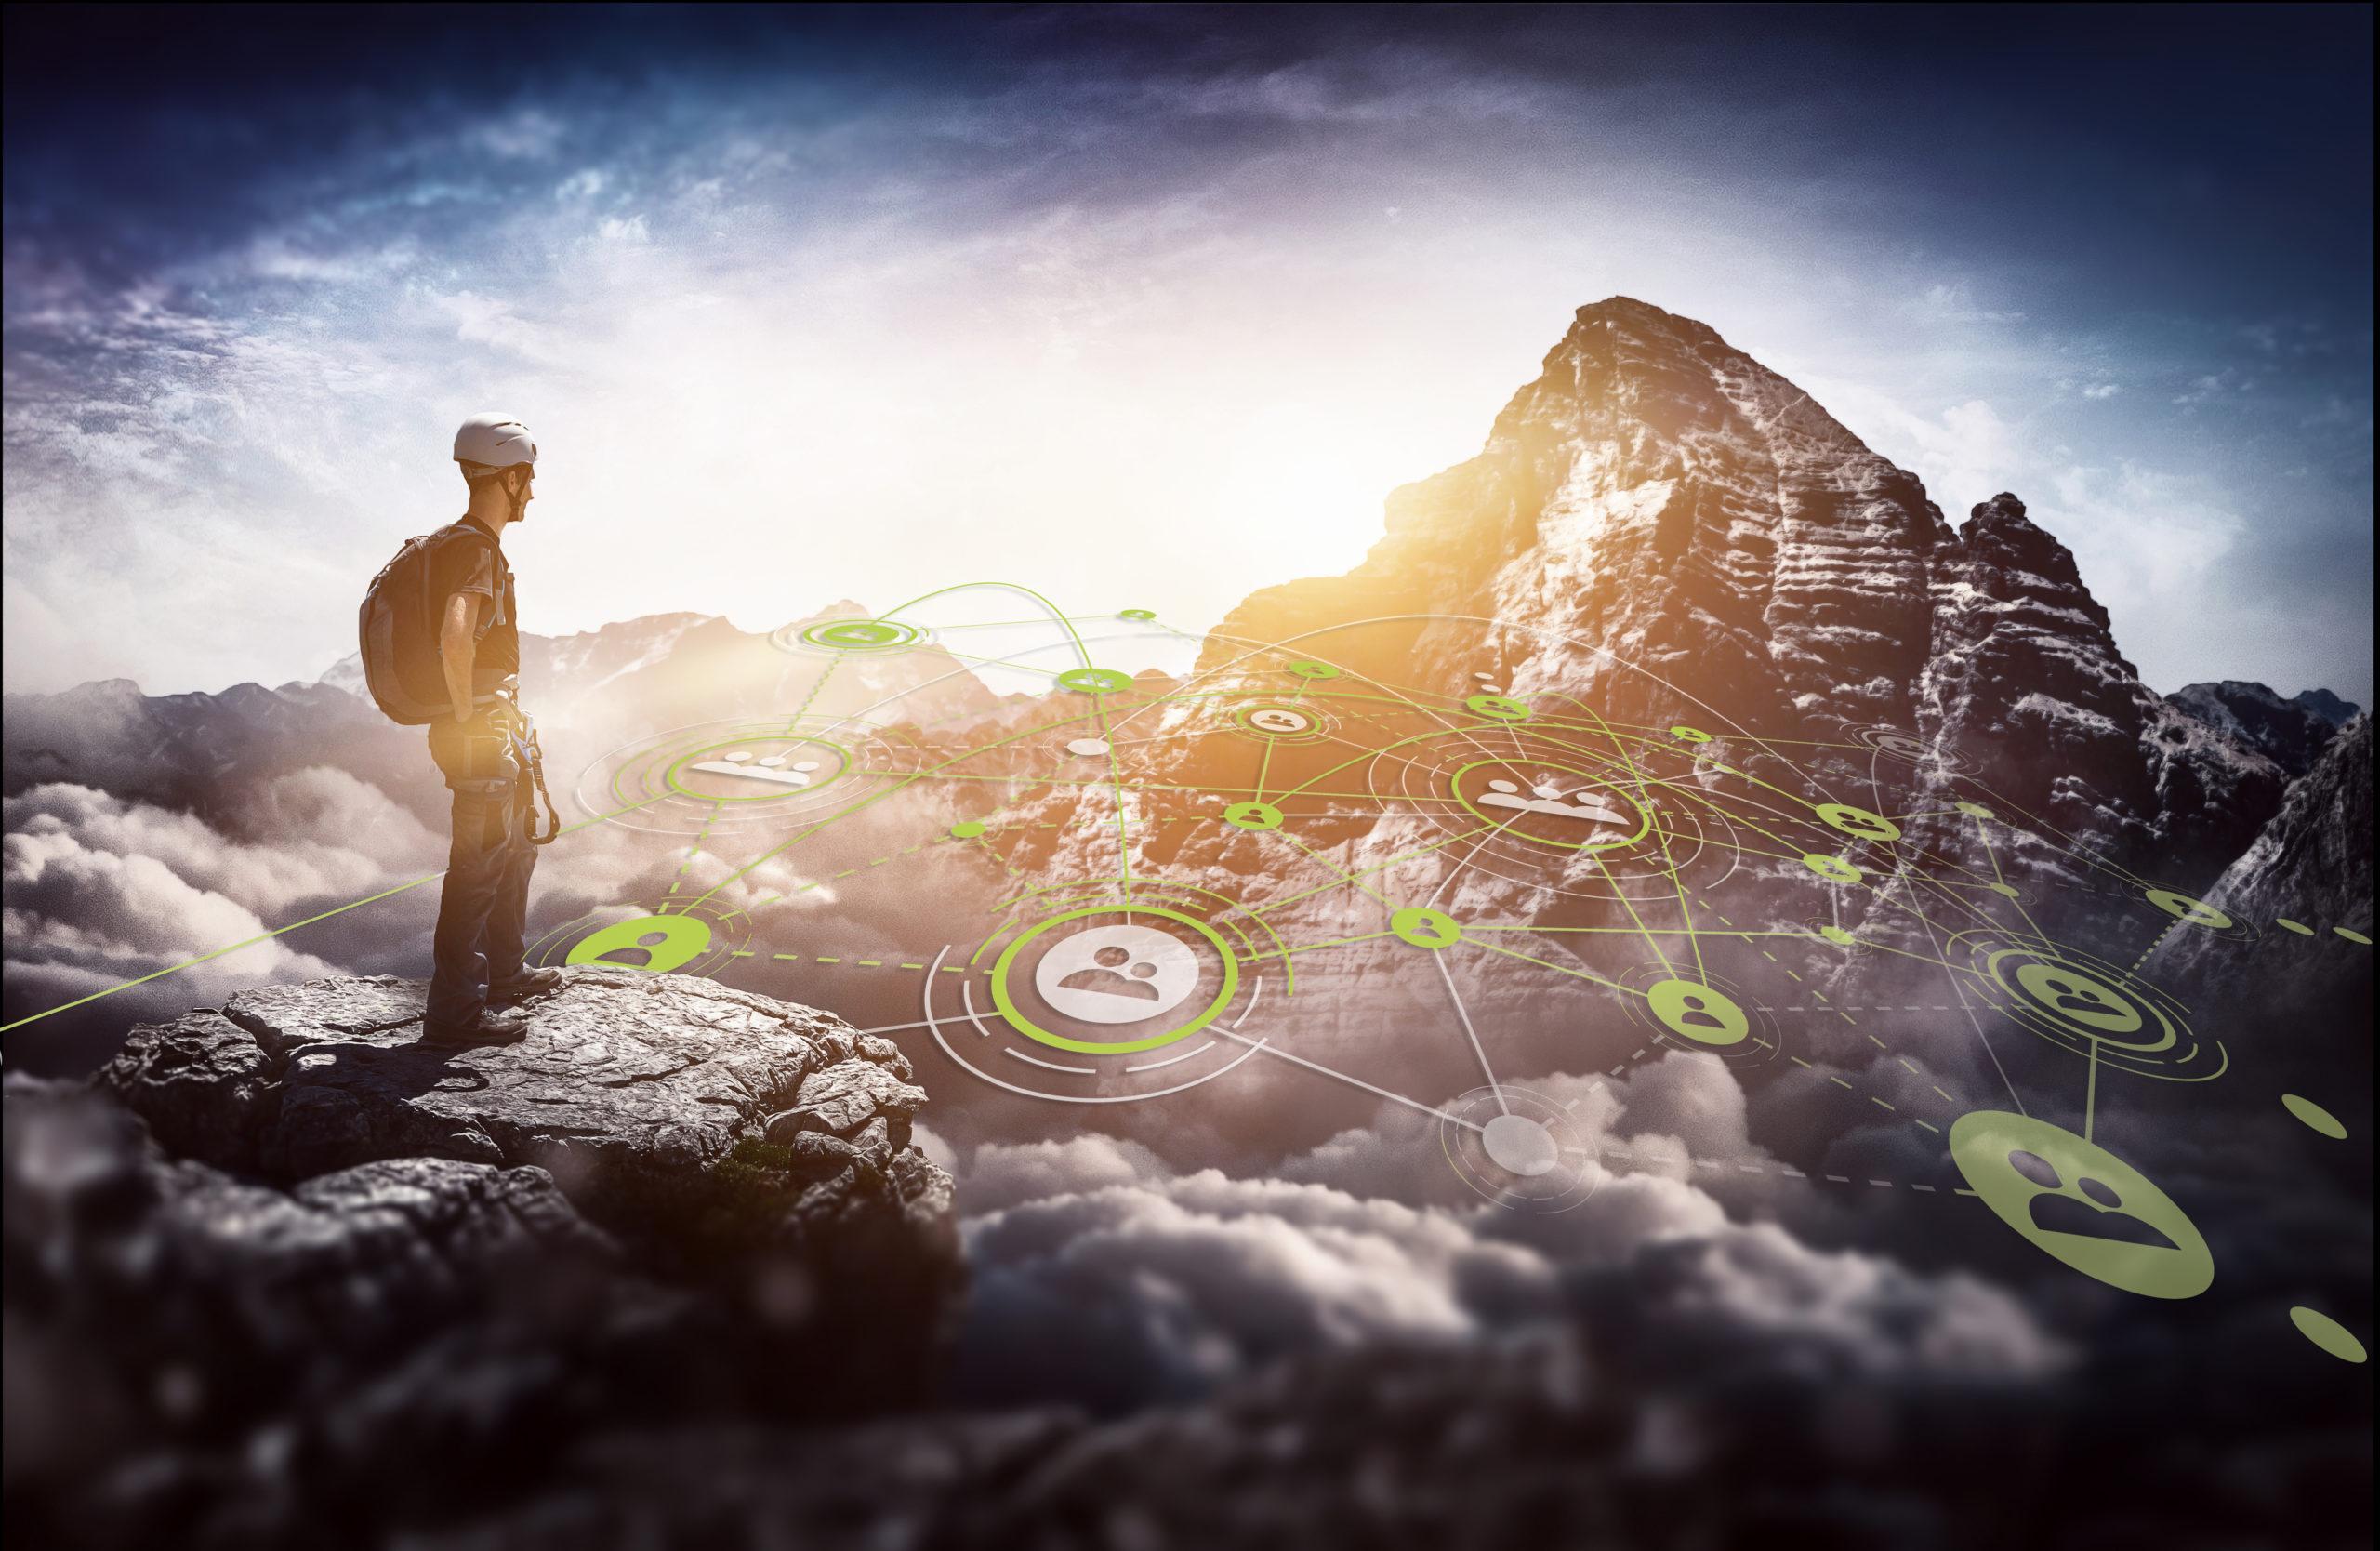 Smarte Wege wagen in beruflichen Transferprozessen